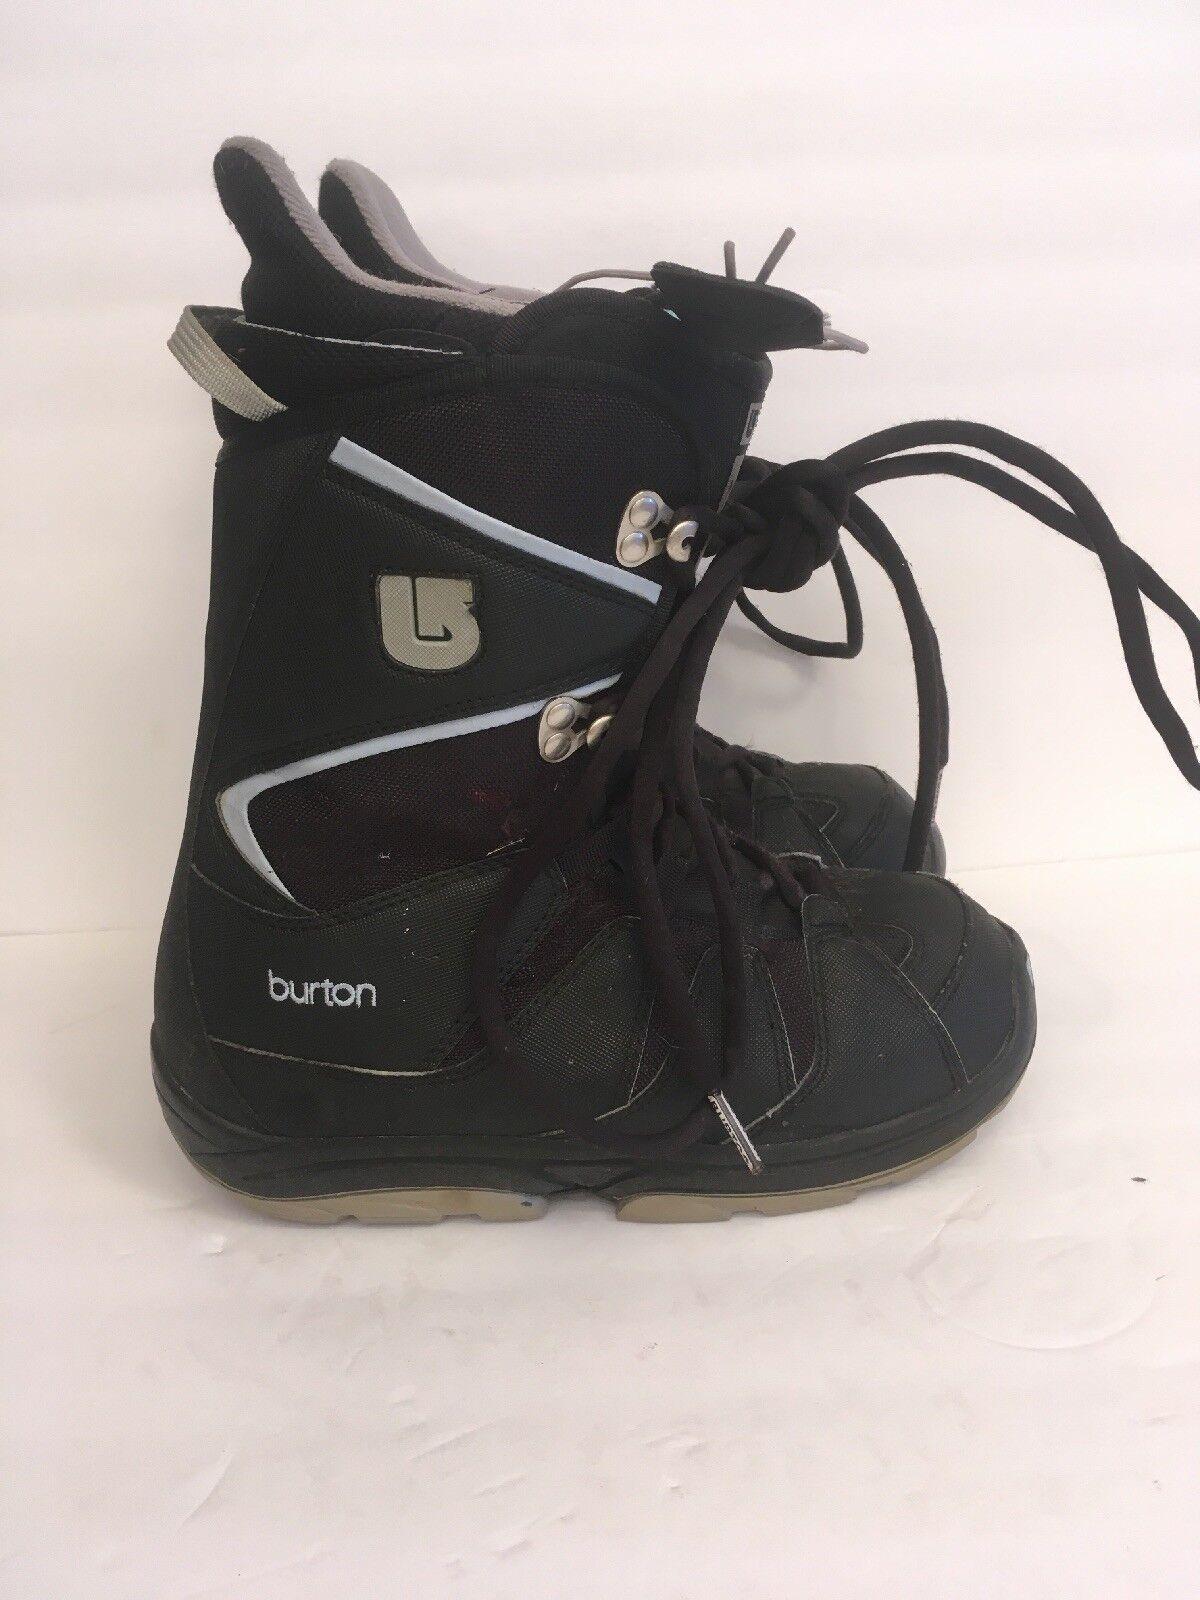 Burton Women's Sz 7 Moto Snowboard Boots